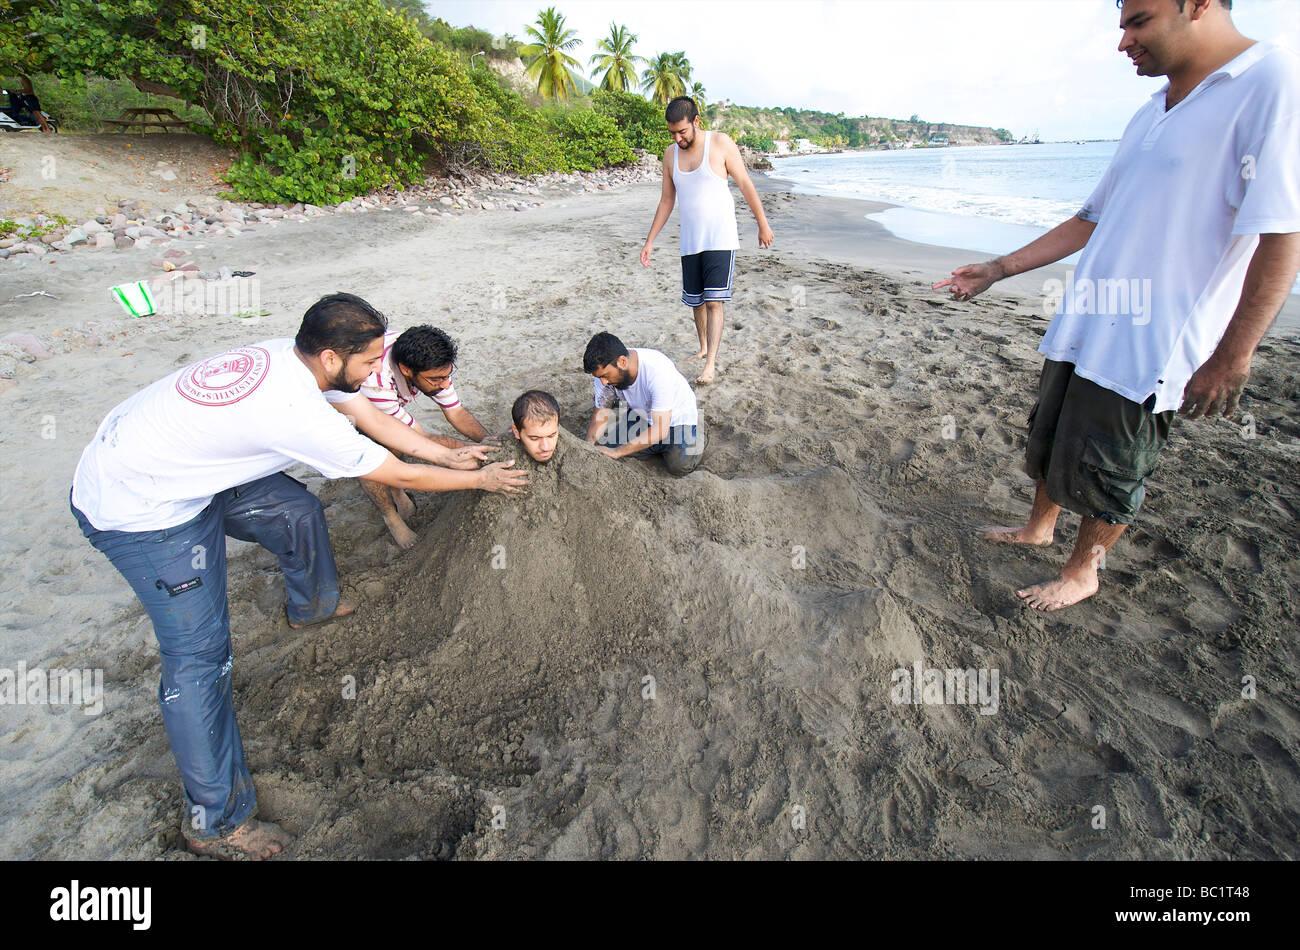 Sint Eustatius students of the medical school having fun on Oranje beach - Stock Image